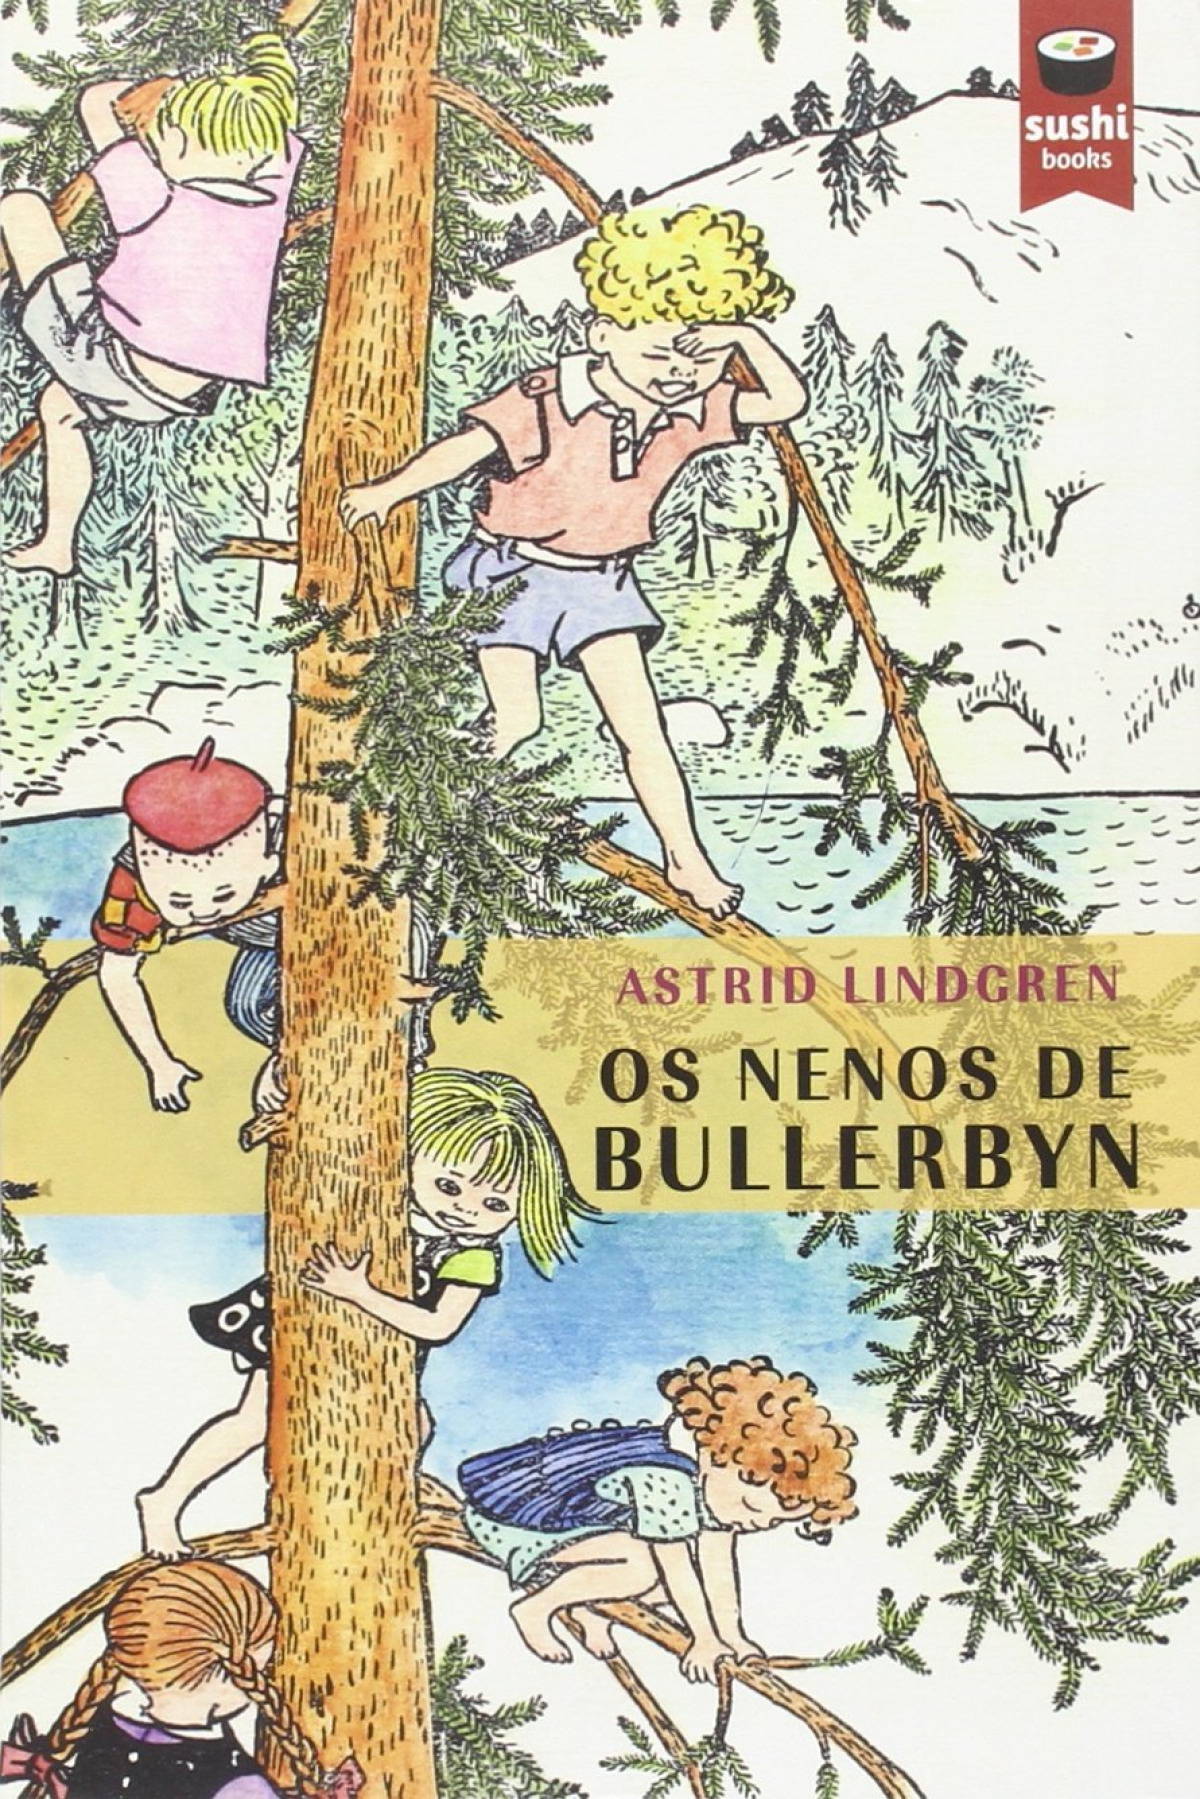 Os nenos de Bullerbyn